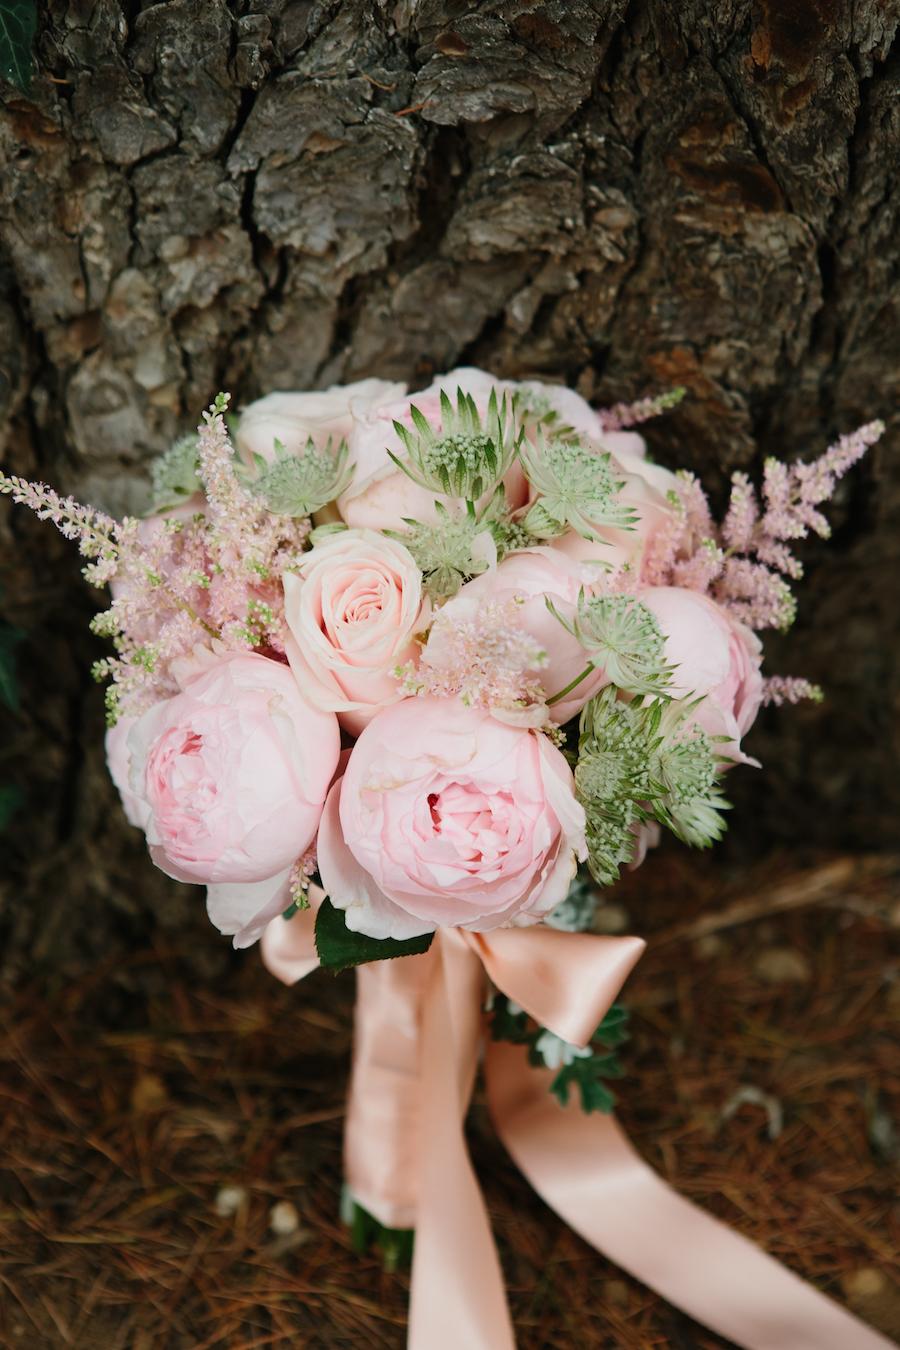 matrimonio-boho-chic-dai-colori-pastelli-la-sposa-vispa-16